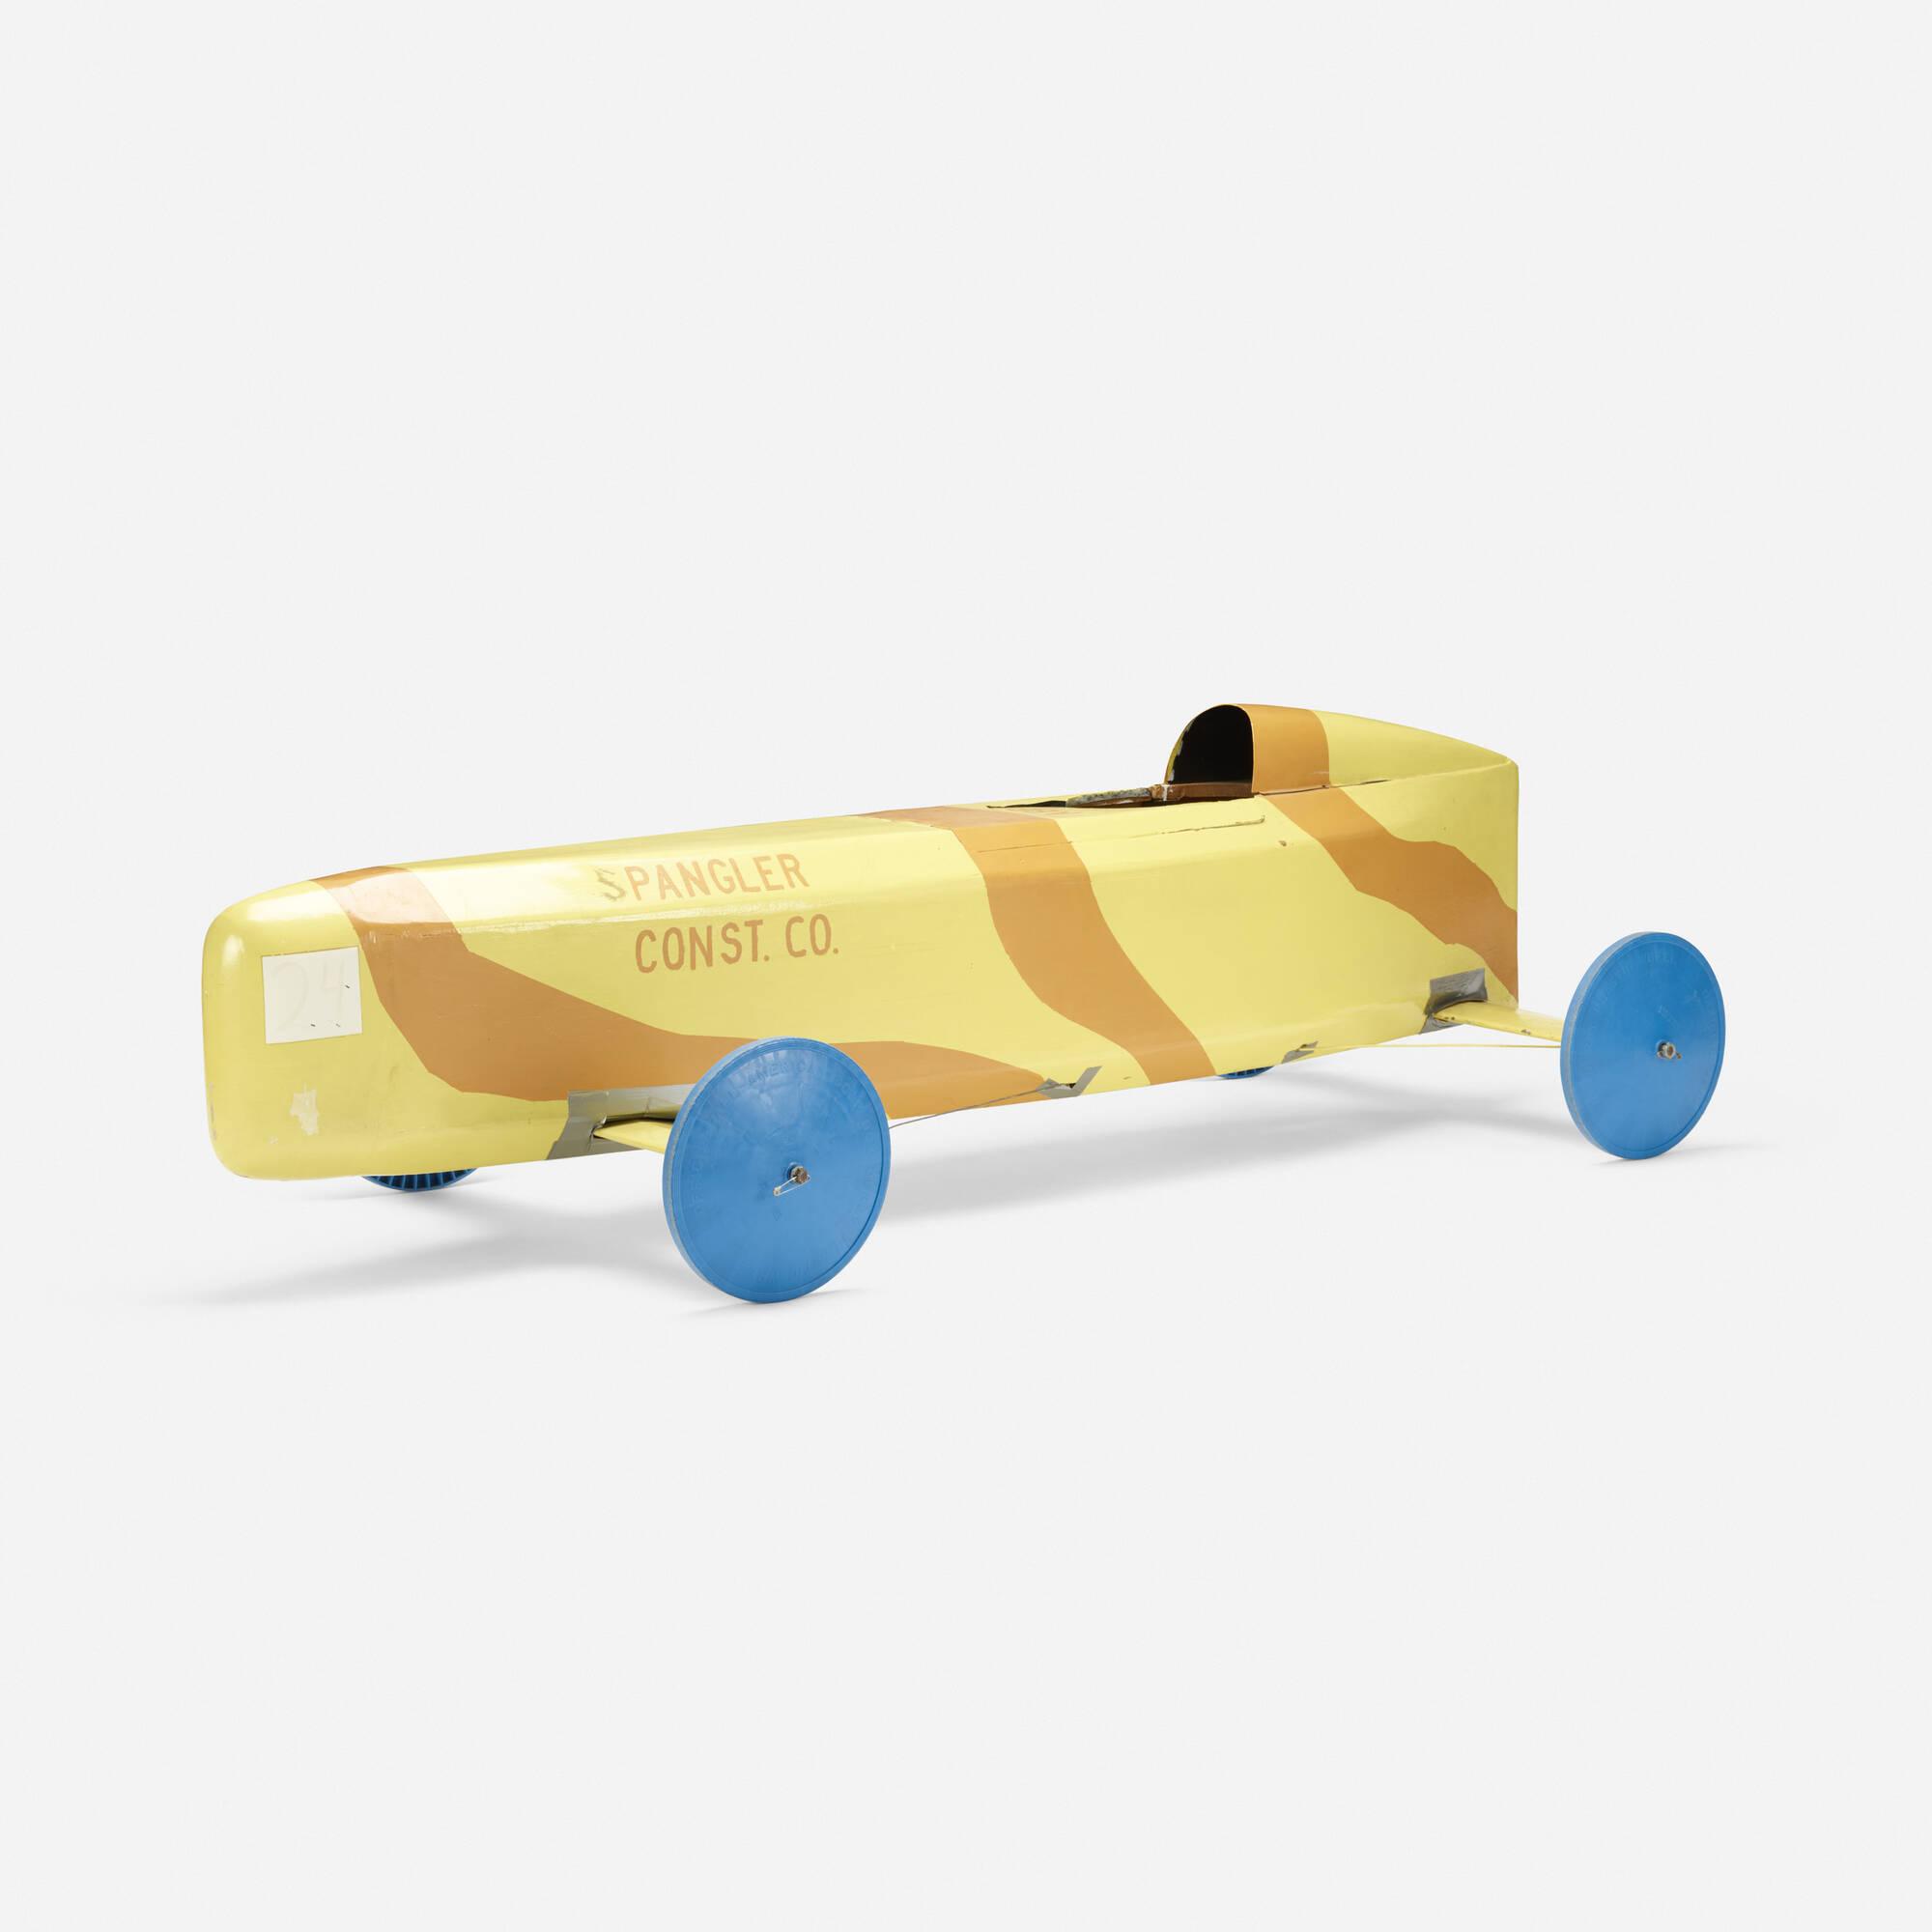 290: American / Soap Box Derby race car (1 of 3)